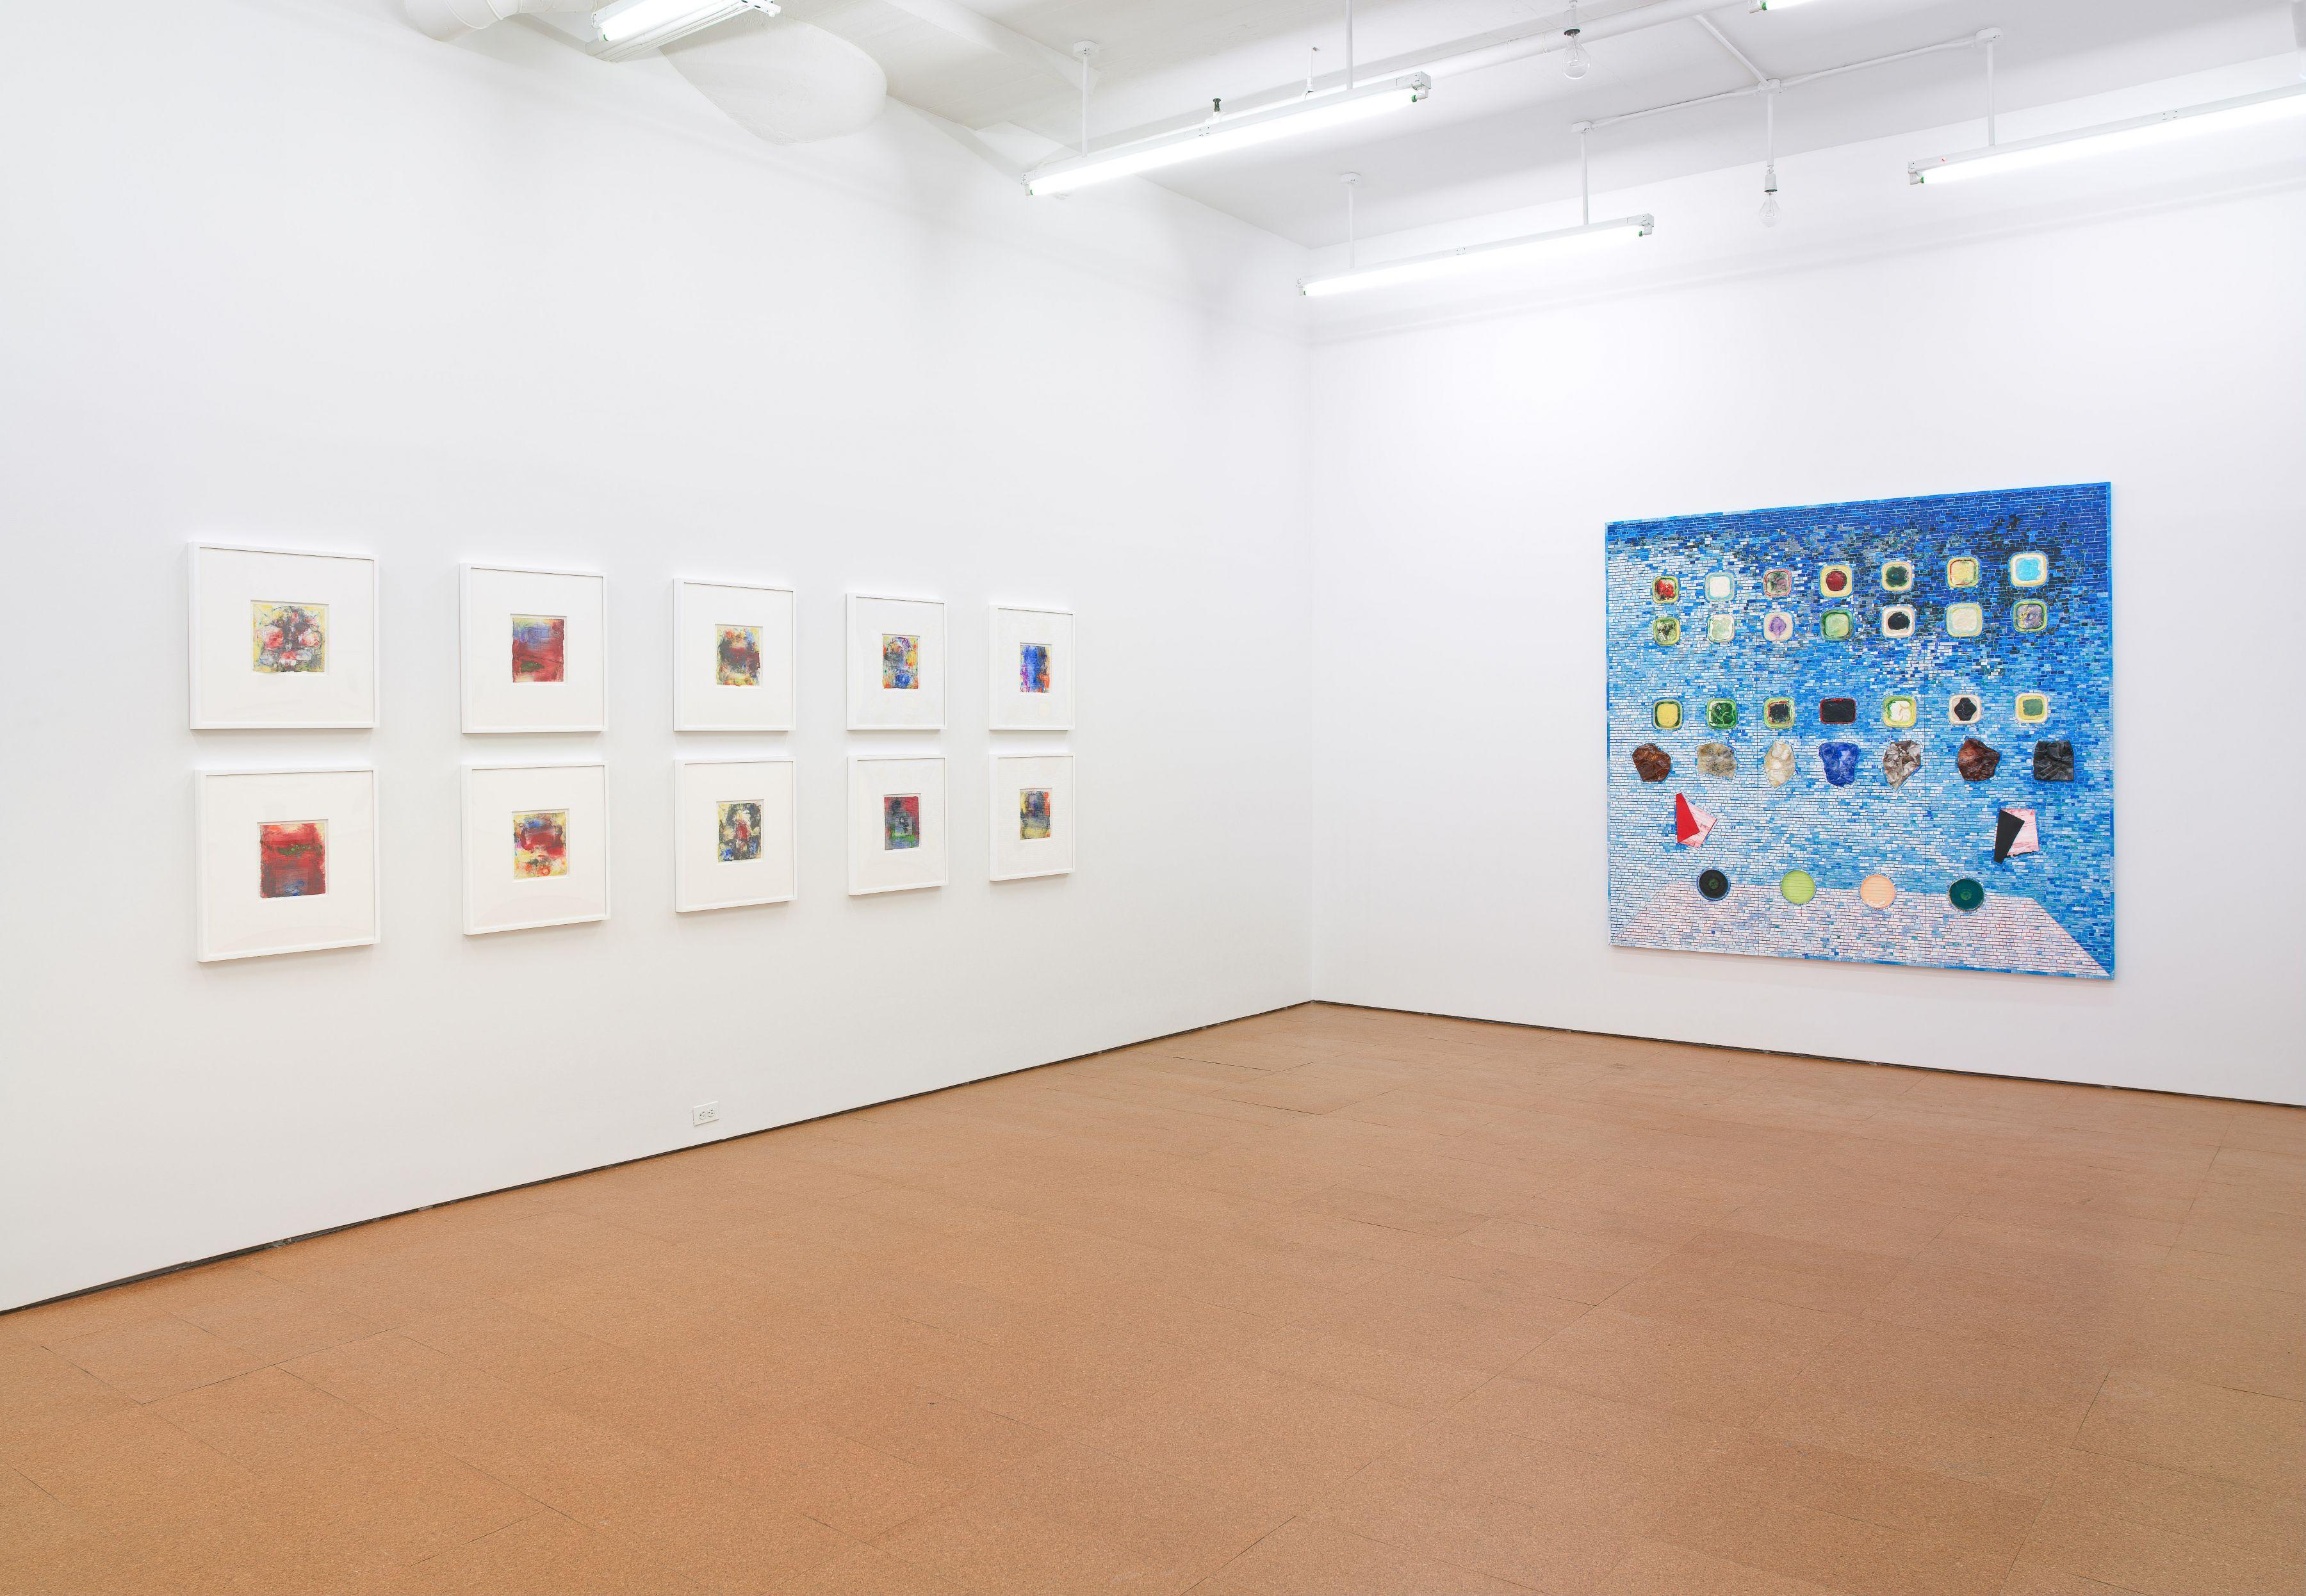 Jack Whitten, Installation view, Alexander Gray Associates,2011